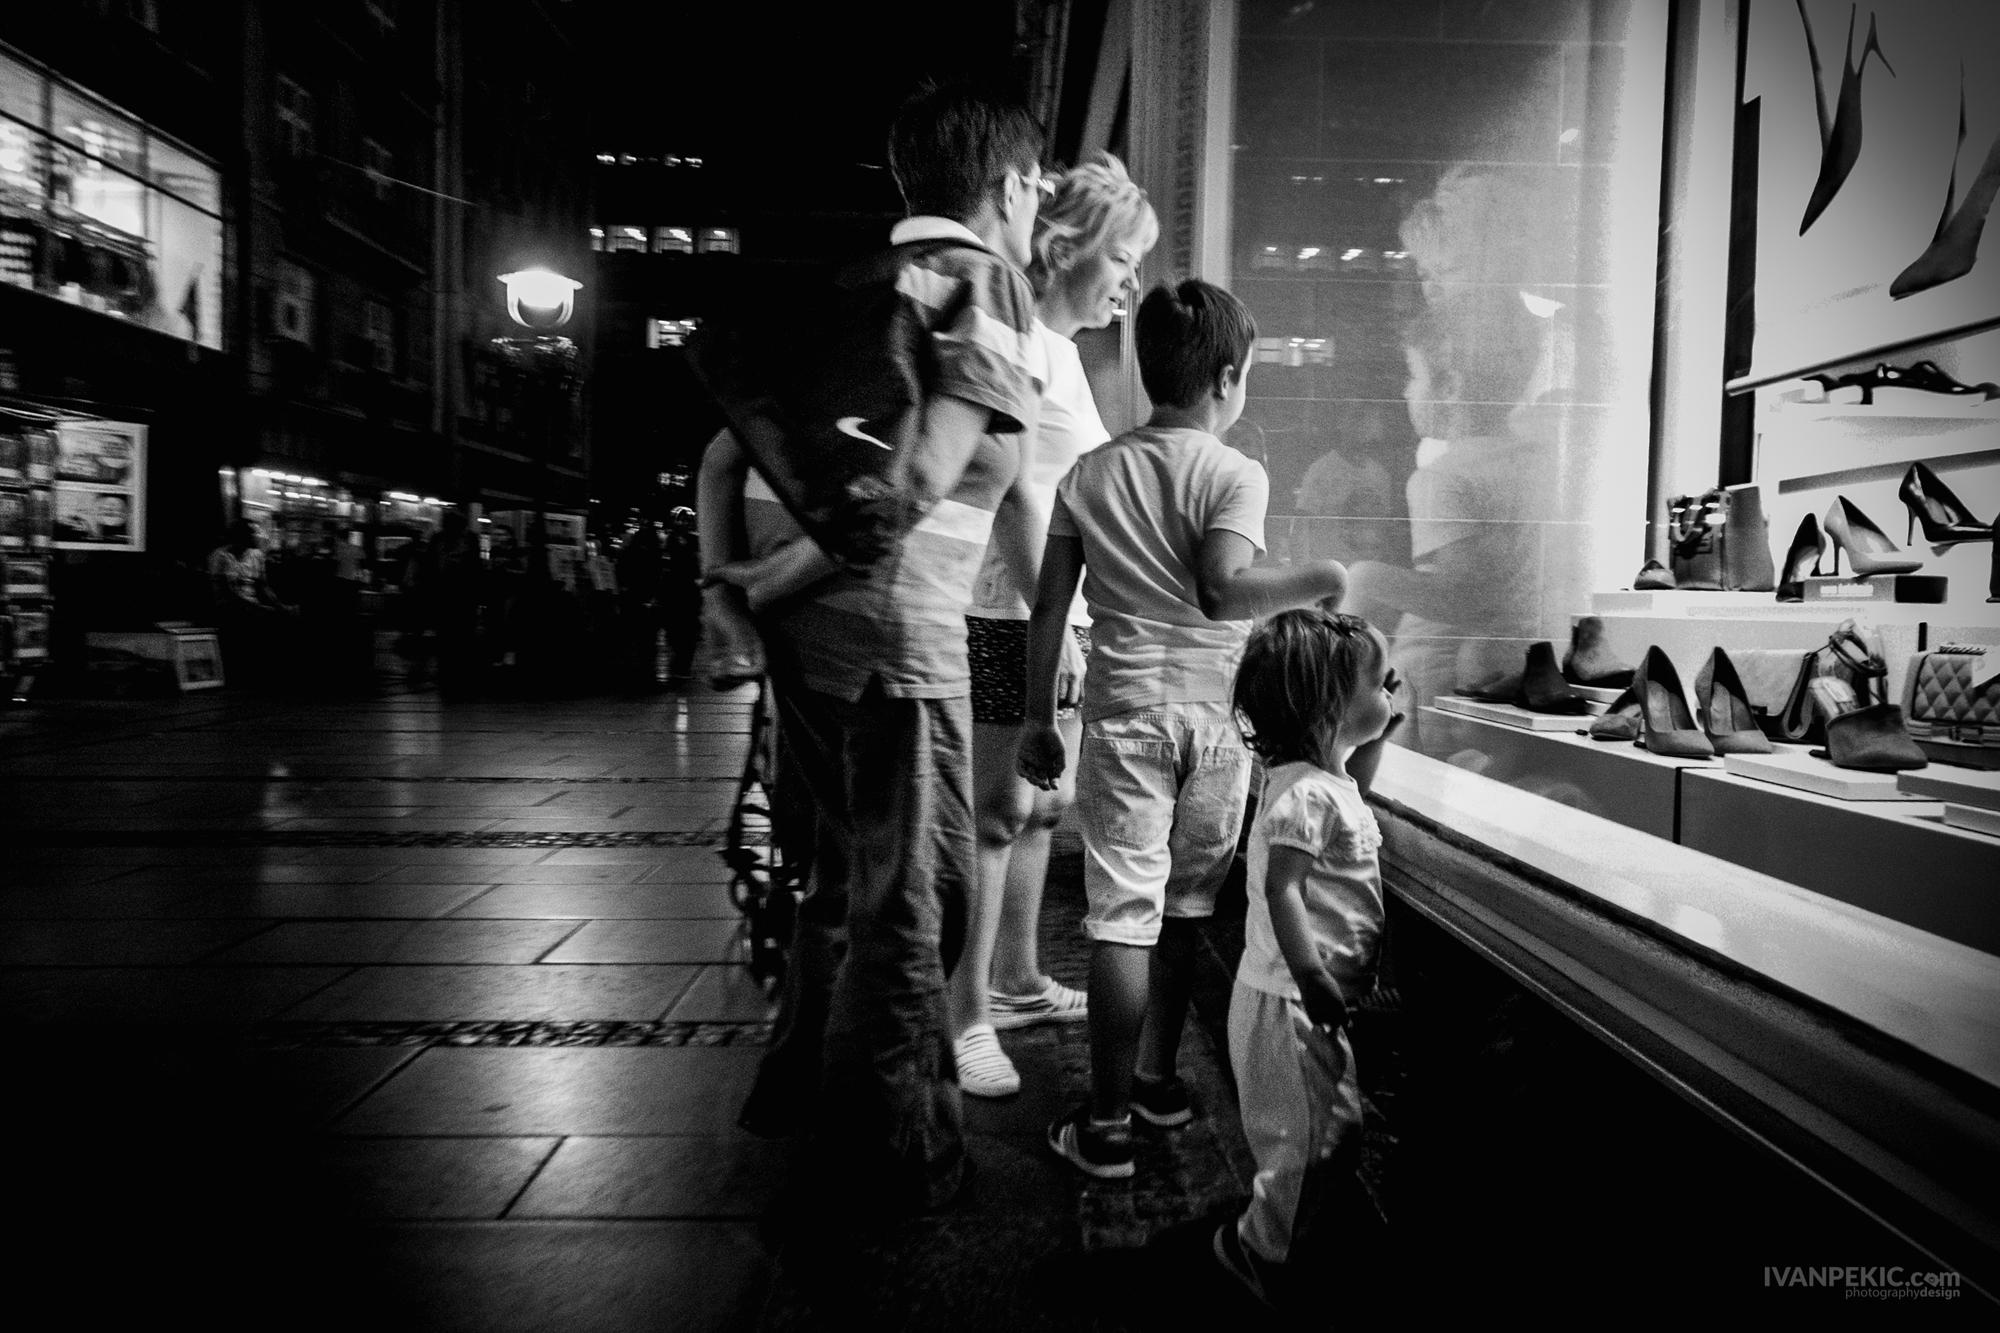 ulica izlog porodica ljudi street.jpg